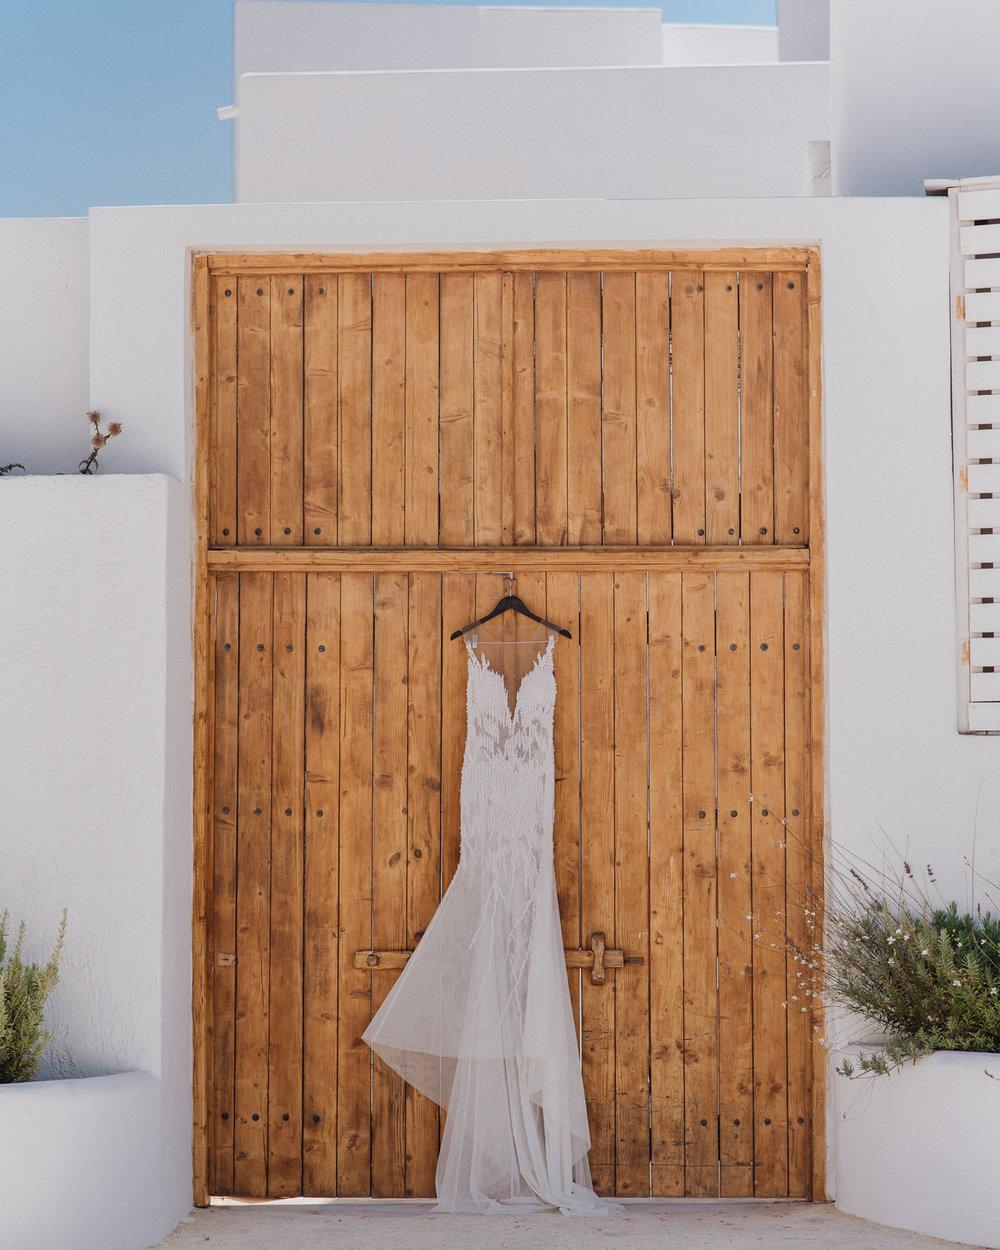 santorini-island-greece-wedding-celebration-bride-groom-rocabella-hotel-silkentile-event-planning-firm